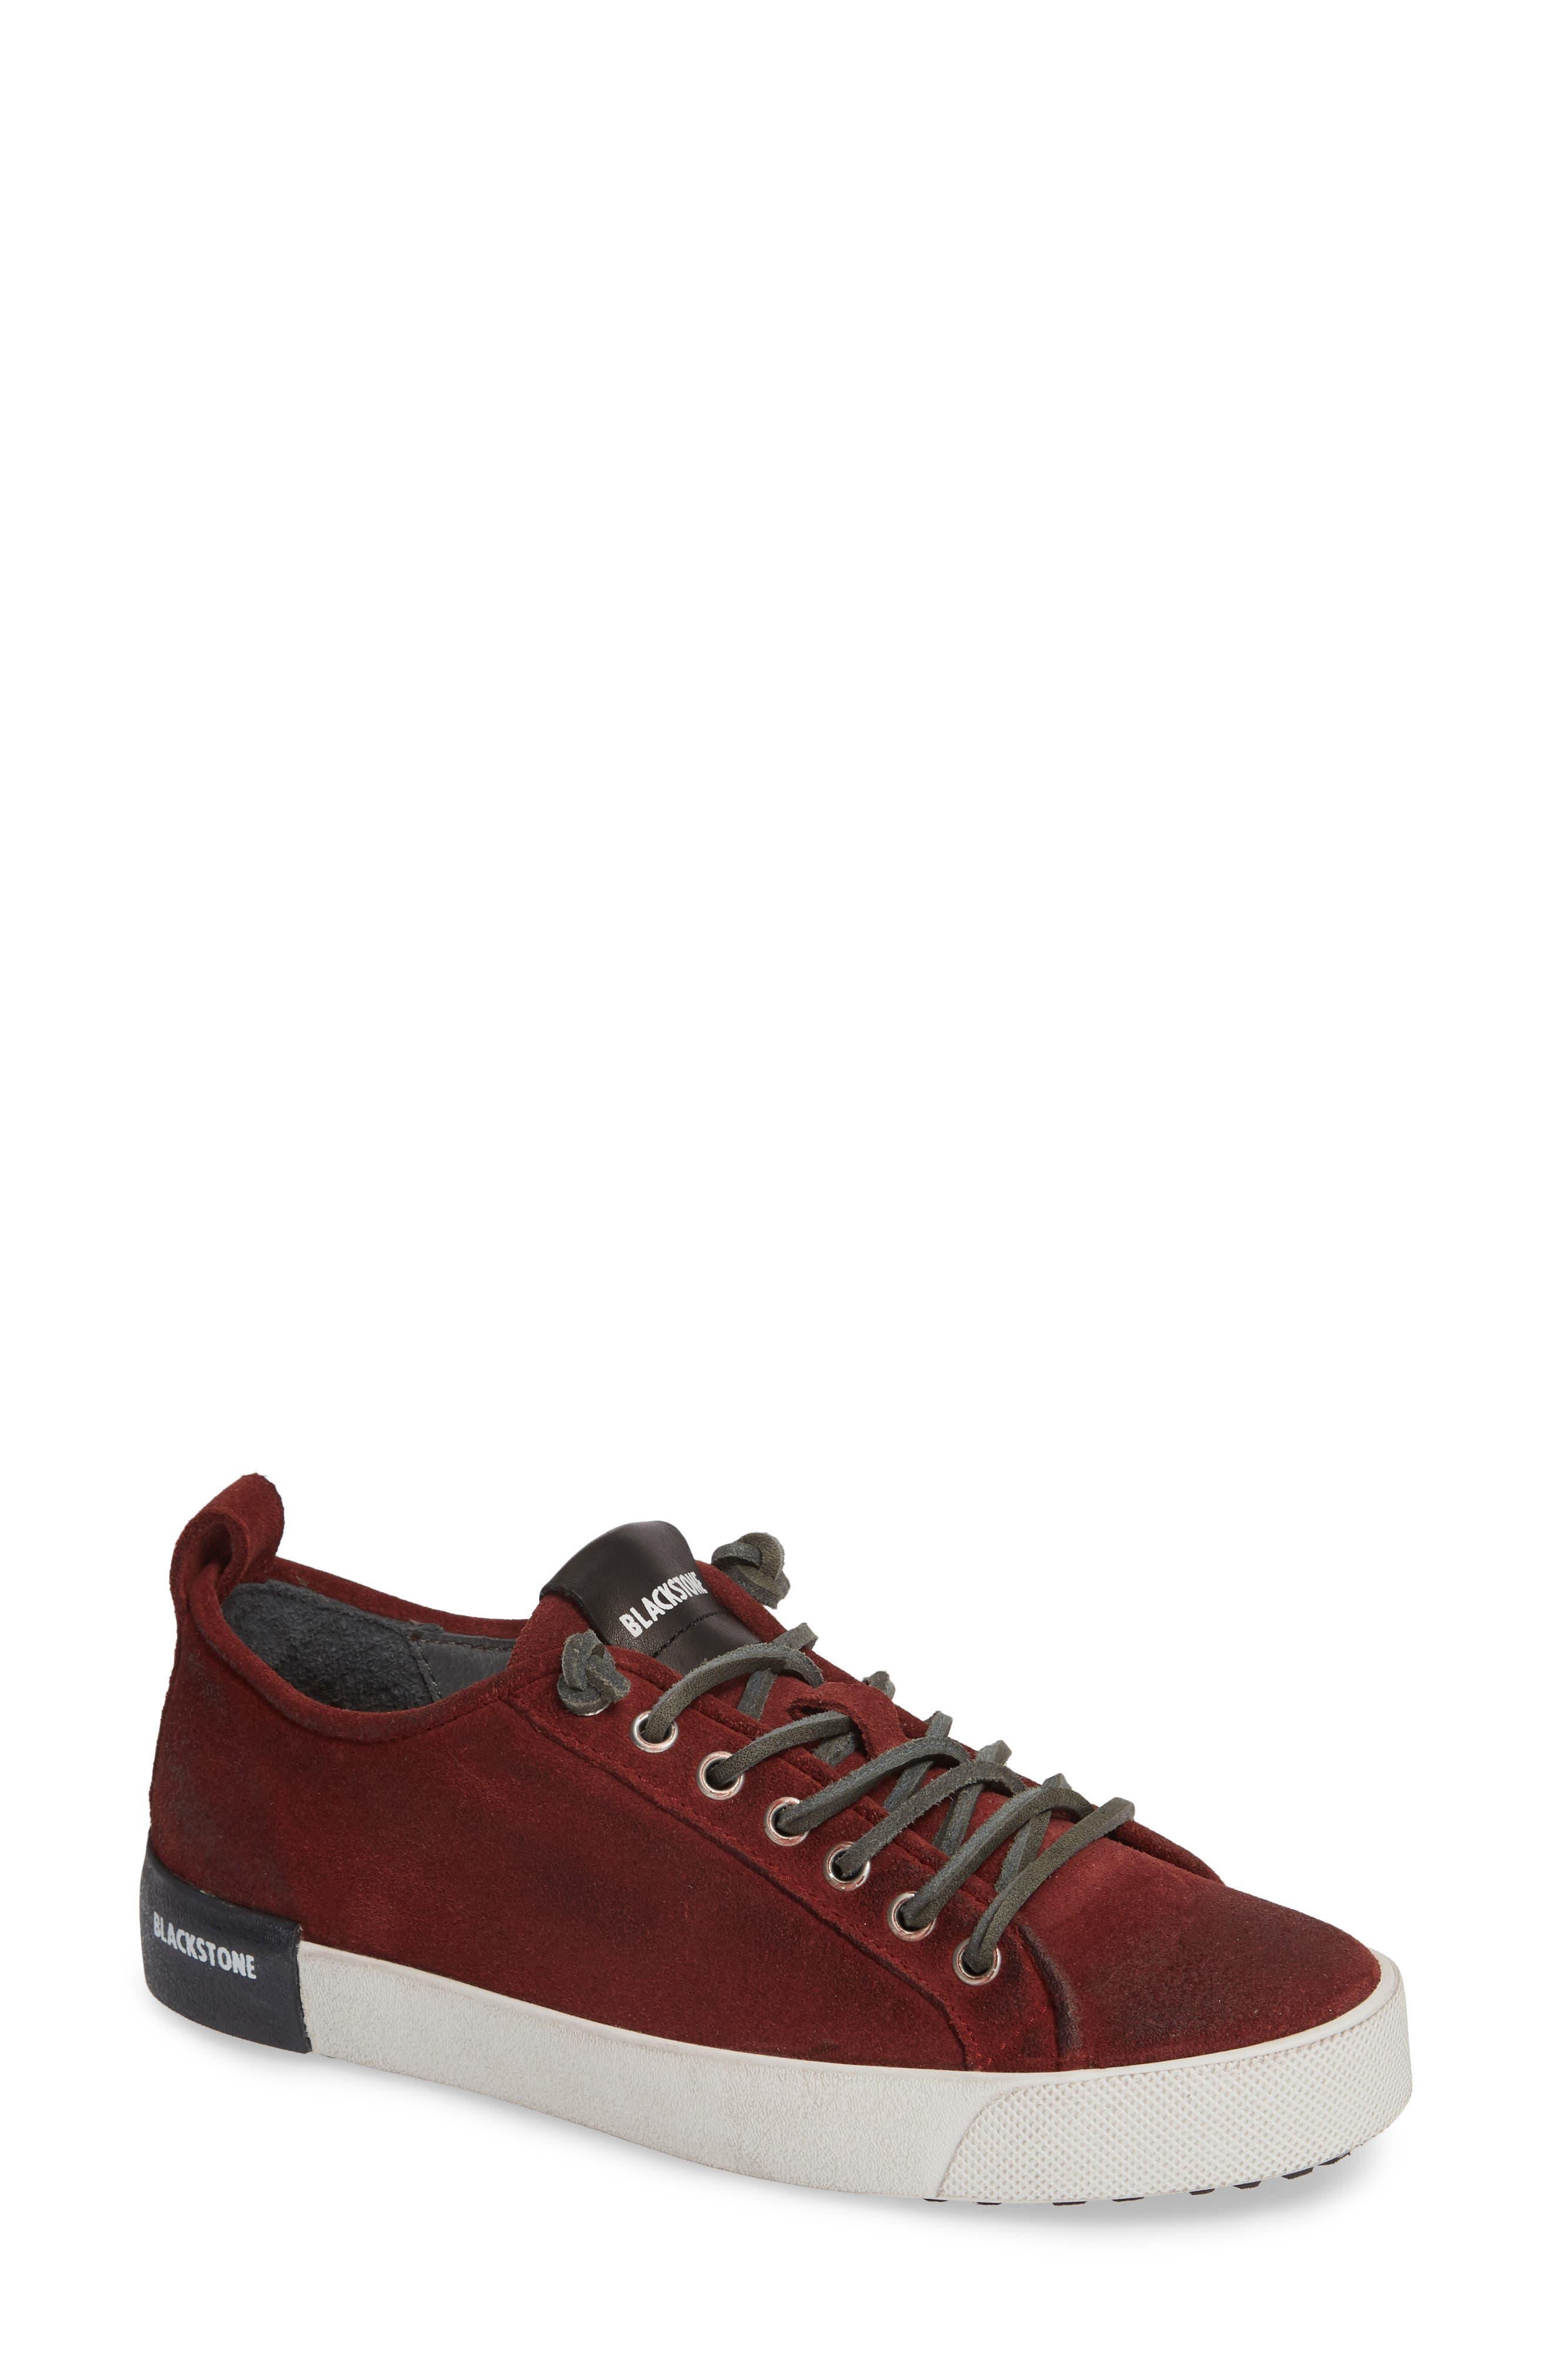 Blackstone Gl60 Sneaker, Burgundy